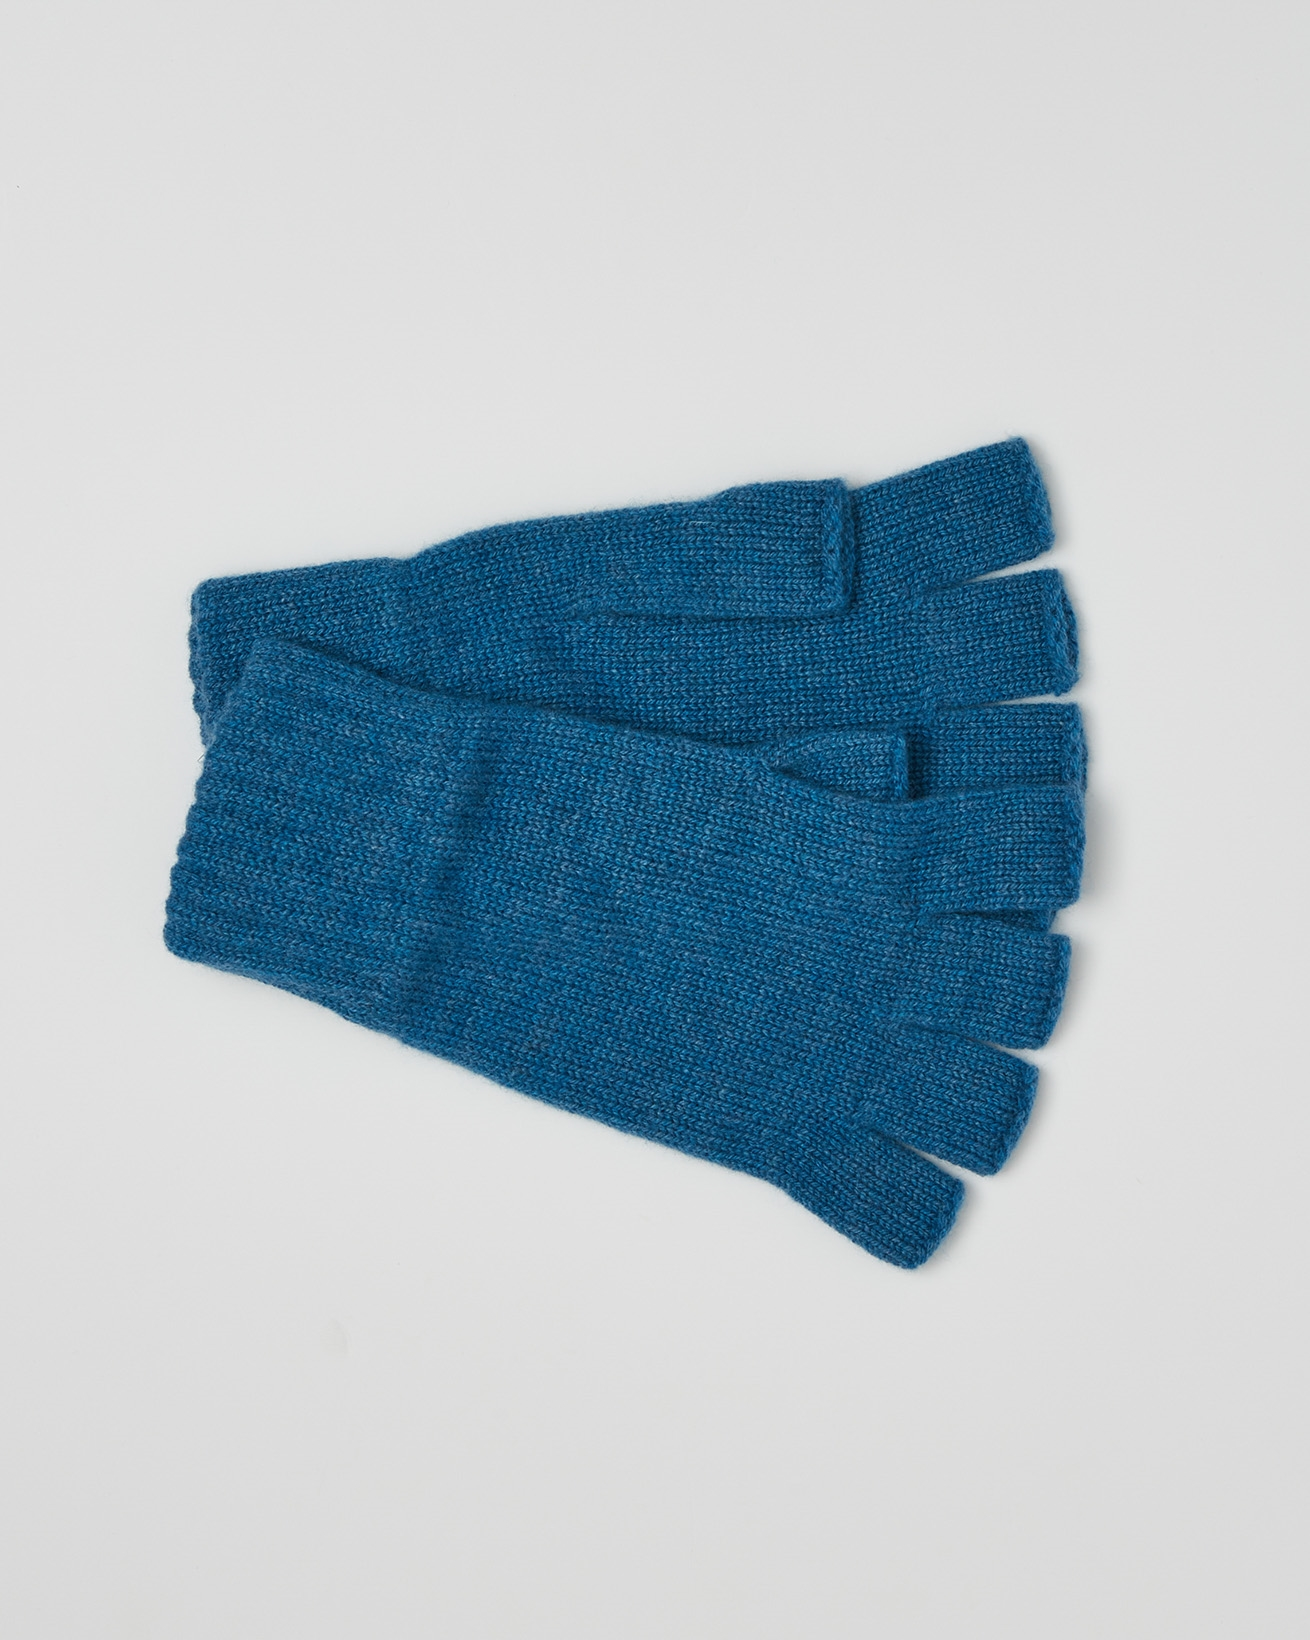 Cashmere Fingerless Gloves - One Size - Cobalt Blue - 2647